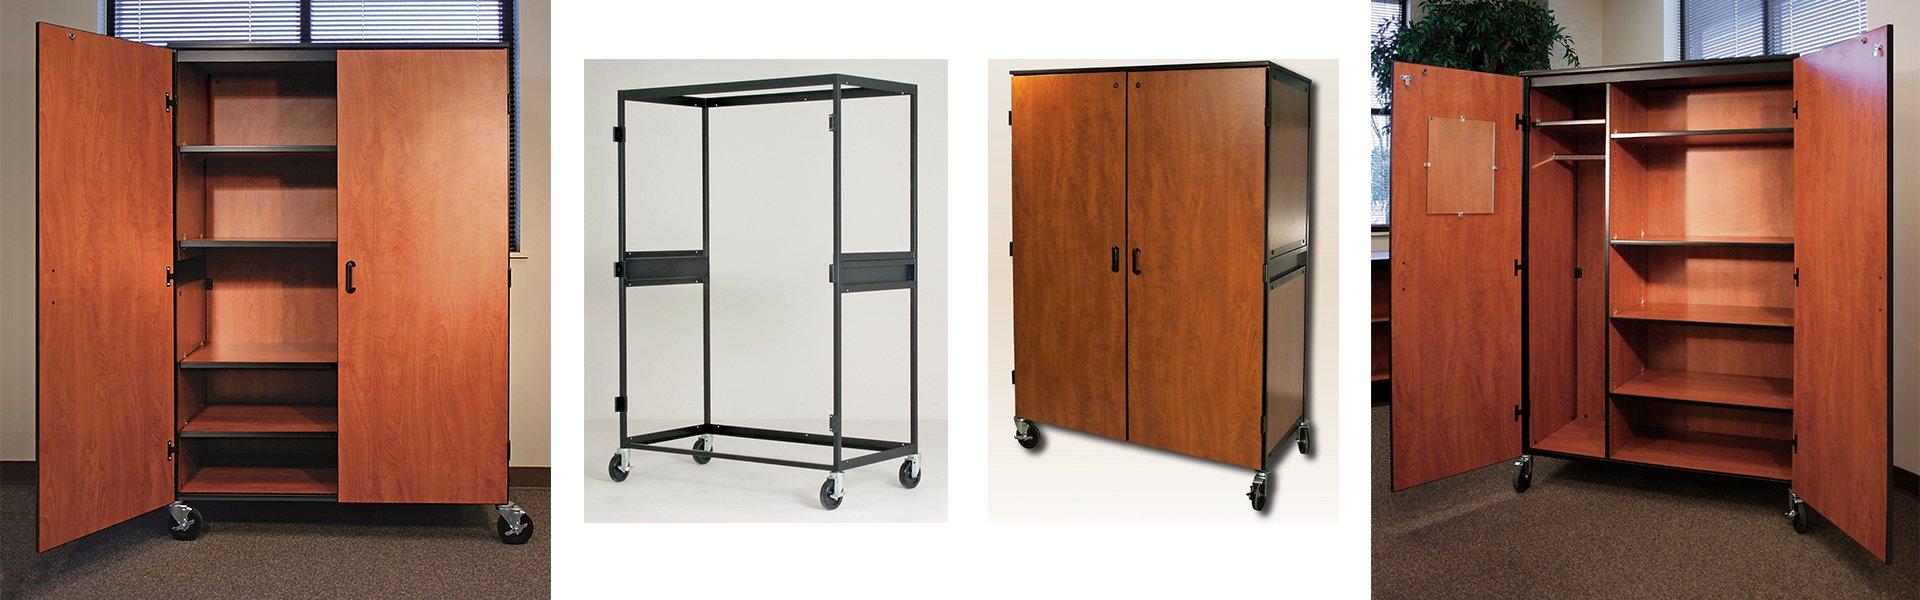 Mobile Teacher & Wardrobe